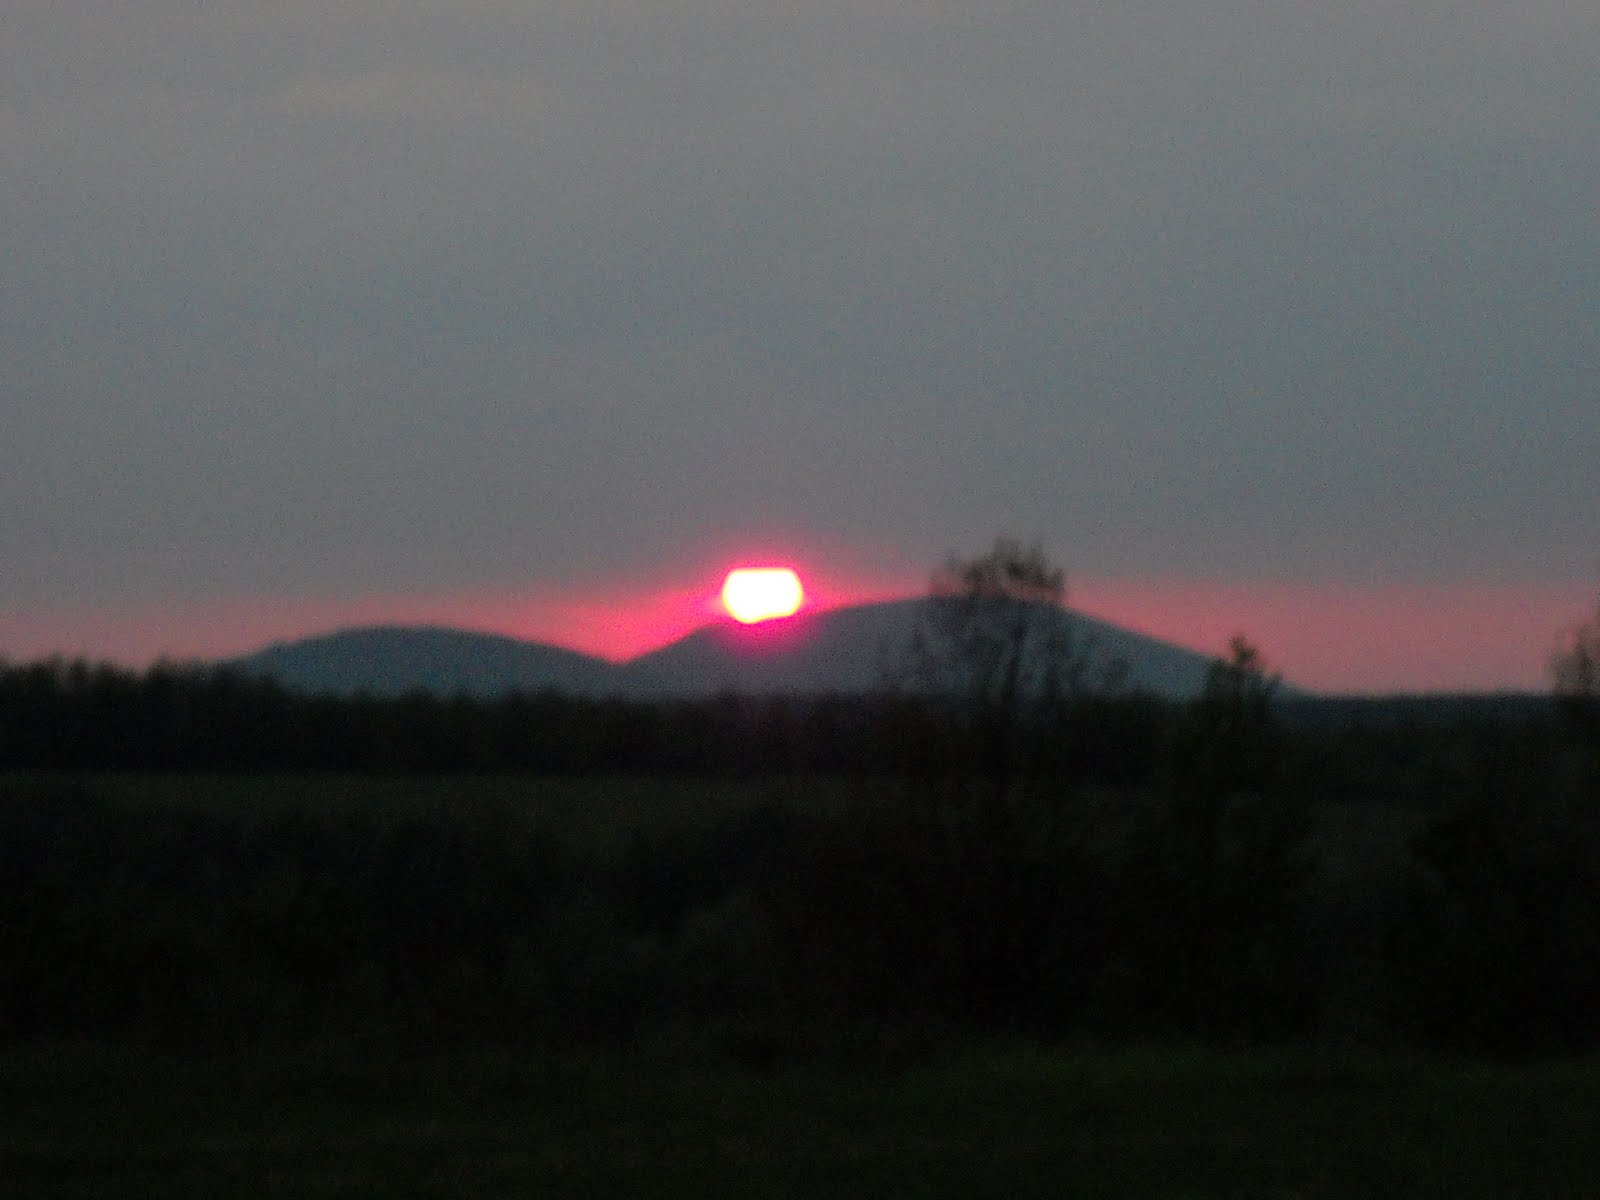 http://3.bp.blogspot.com/_ILnlQVHu15Q/S9bbdr7YmwI/AAAAAAAABNQ/EnaPHtabBzg/s1600/apus+de+soare+peste+Dealul+Mocrii.jpg